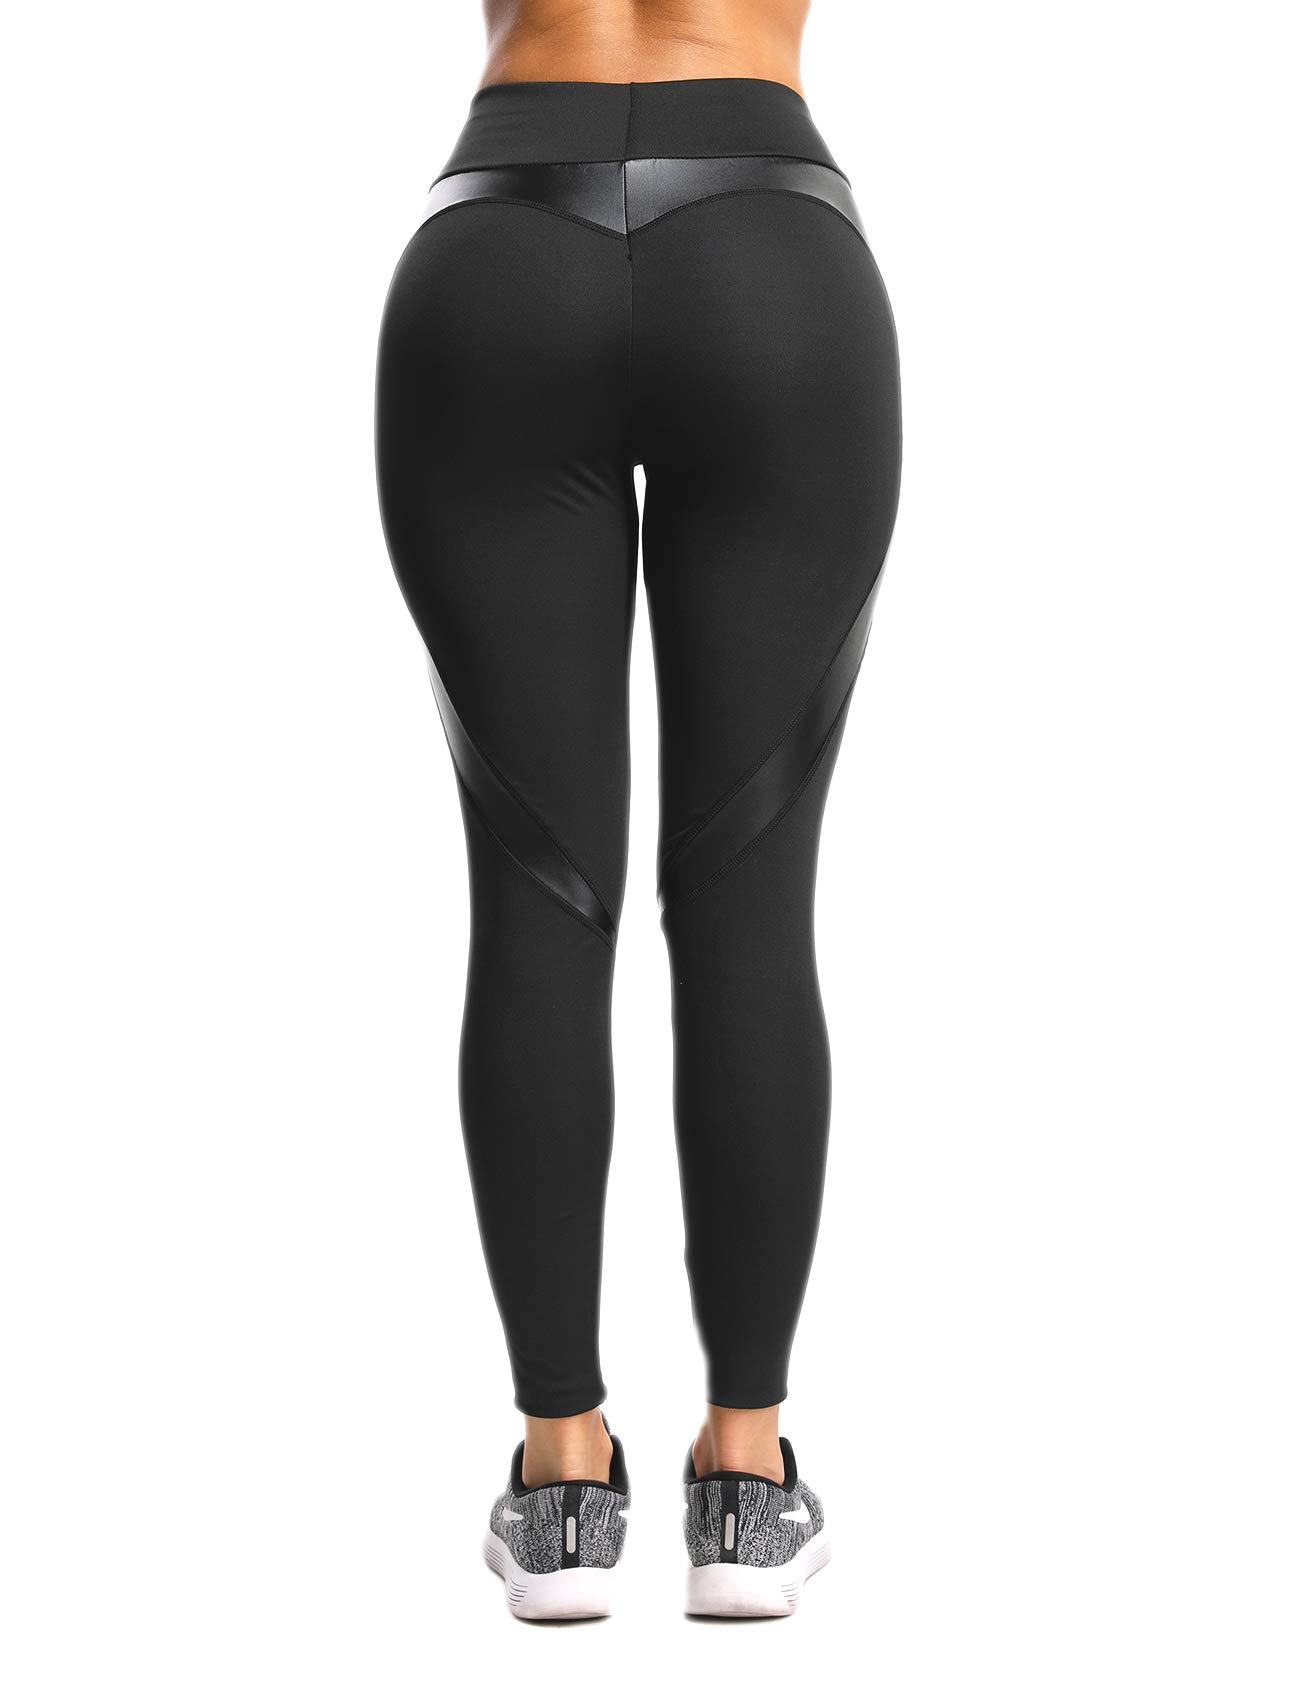 232dd7359f7e8a SEASUM Women Yoga Pants Heart Shape Patchwork Leggings High Waist Capris  Workout Sport Fitness Gym Tights S